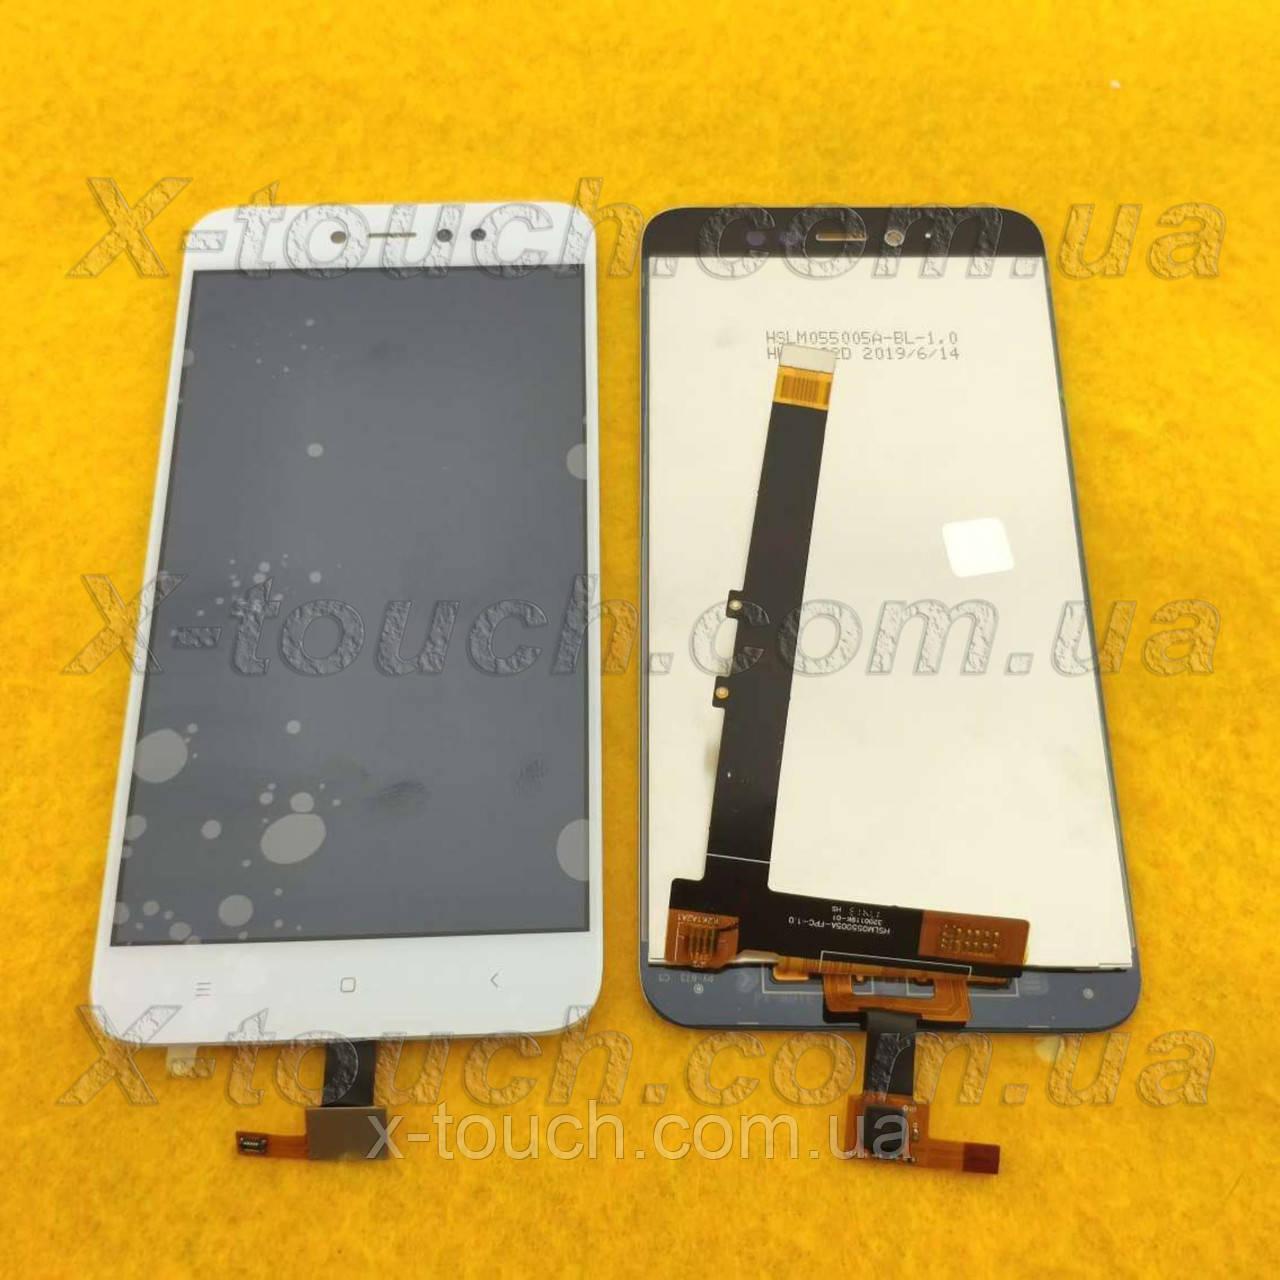 Модуль Xiaomi Redmi Note 5A Prime (LCD) дисплей с сенсором для телефона, белый.